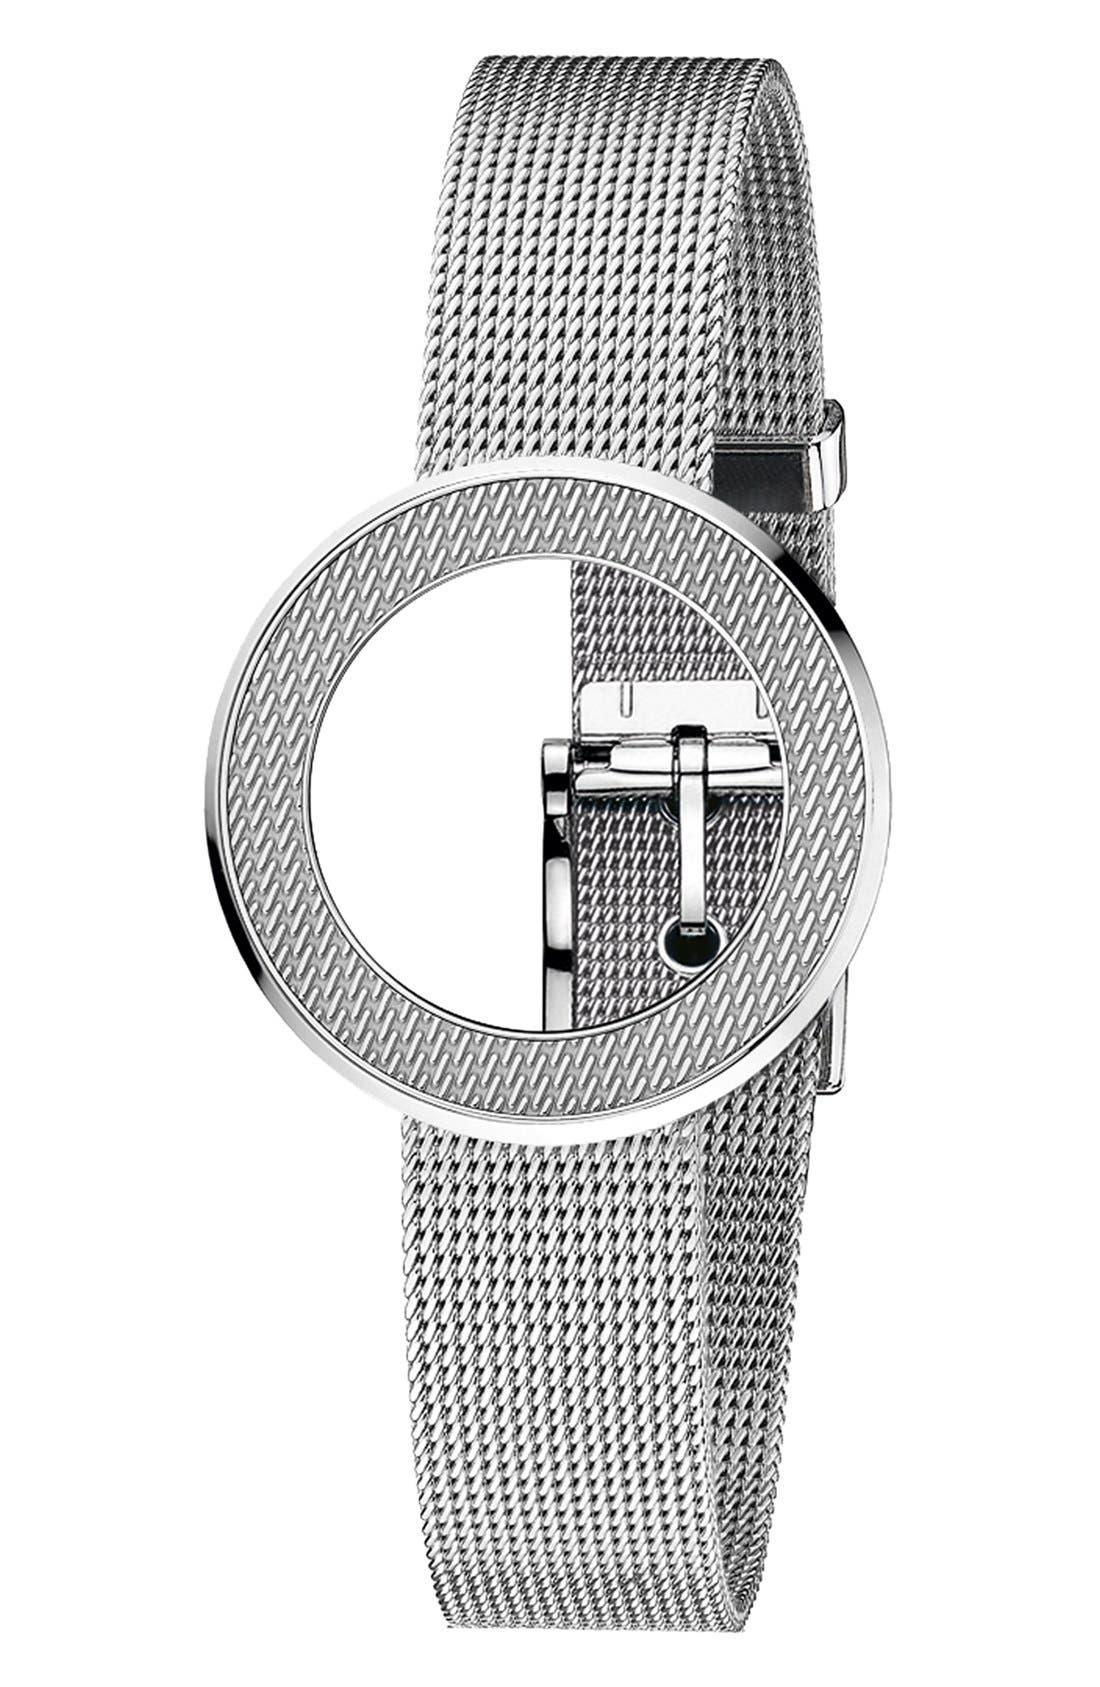 Alternate Image 1 Selected - Gucci 'U-Play' Mesh Bezel & Watch Bracelet, 27mm